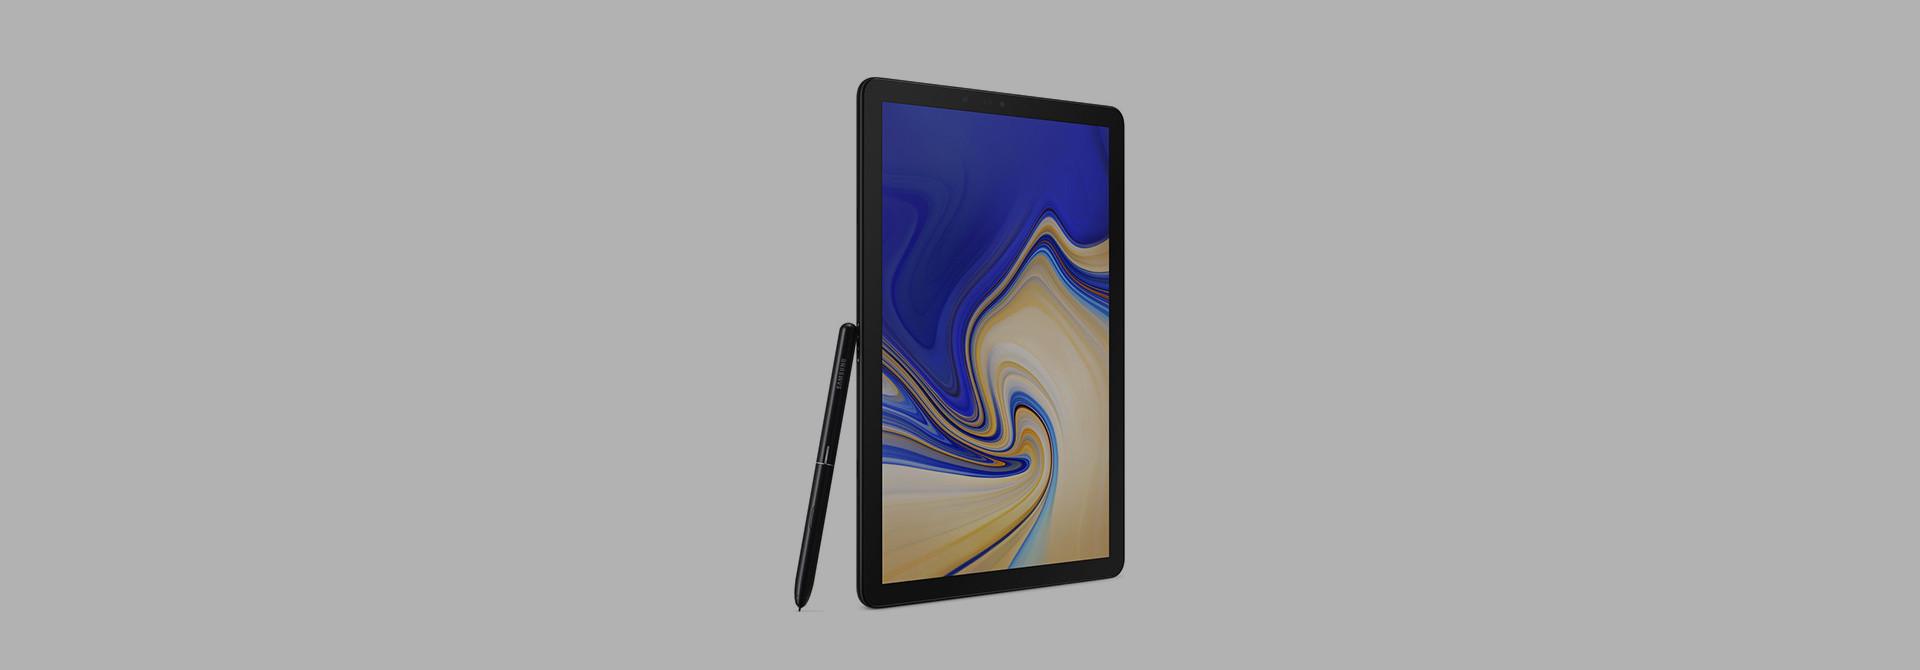 Samsung Galaxy Tablet Sleeve